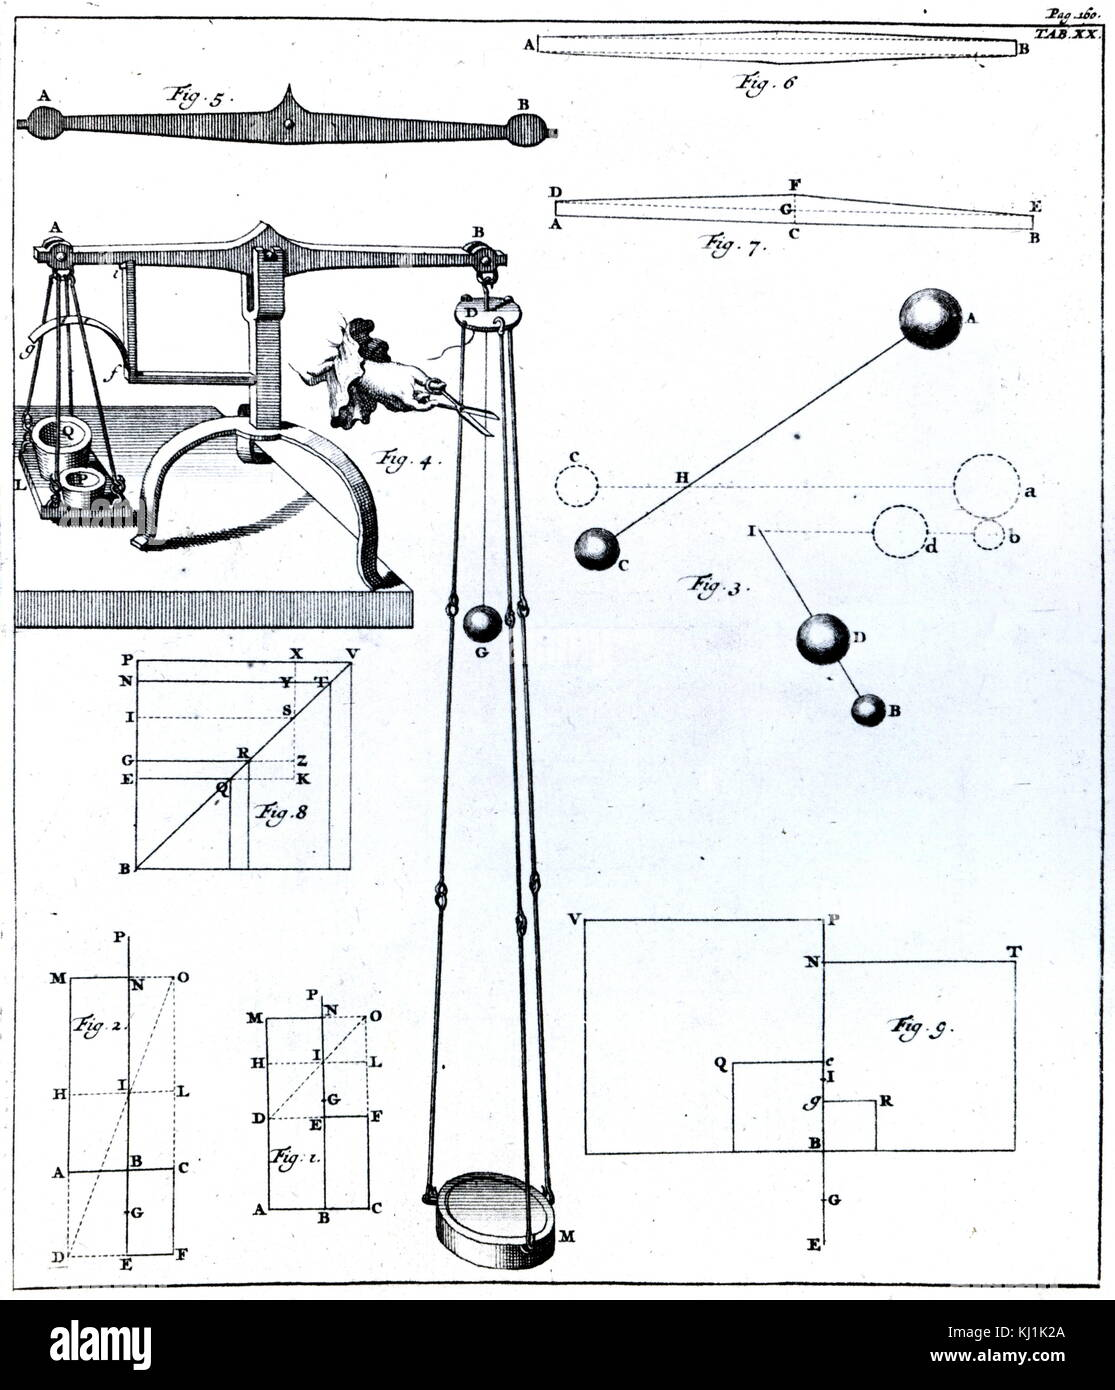 Law Of Universal Gravitation Worksheet 8 2